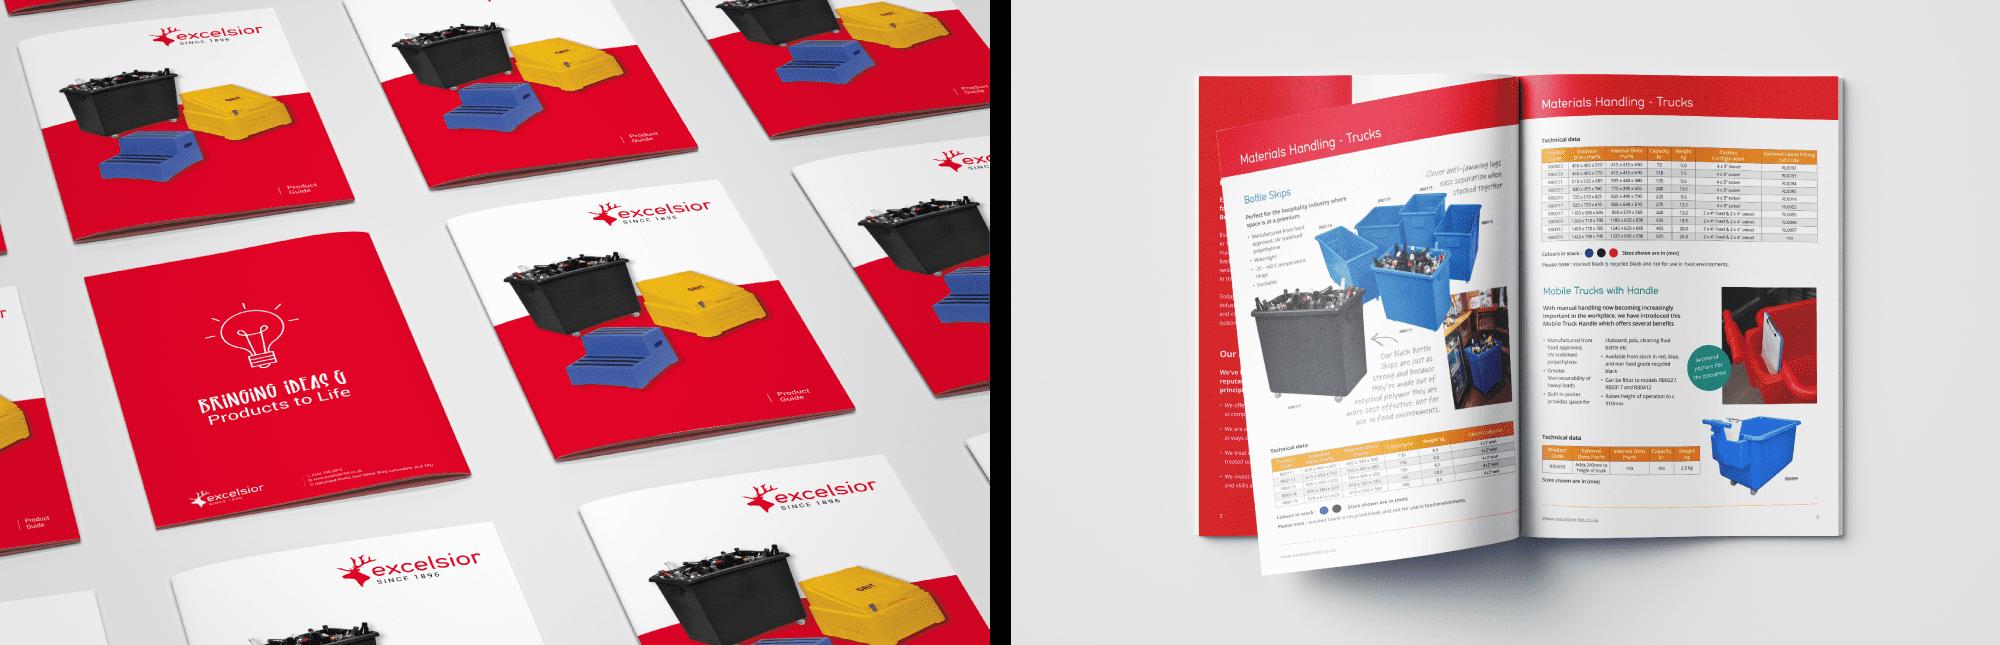 Excelsior - Graphic Design